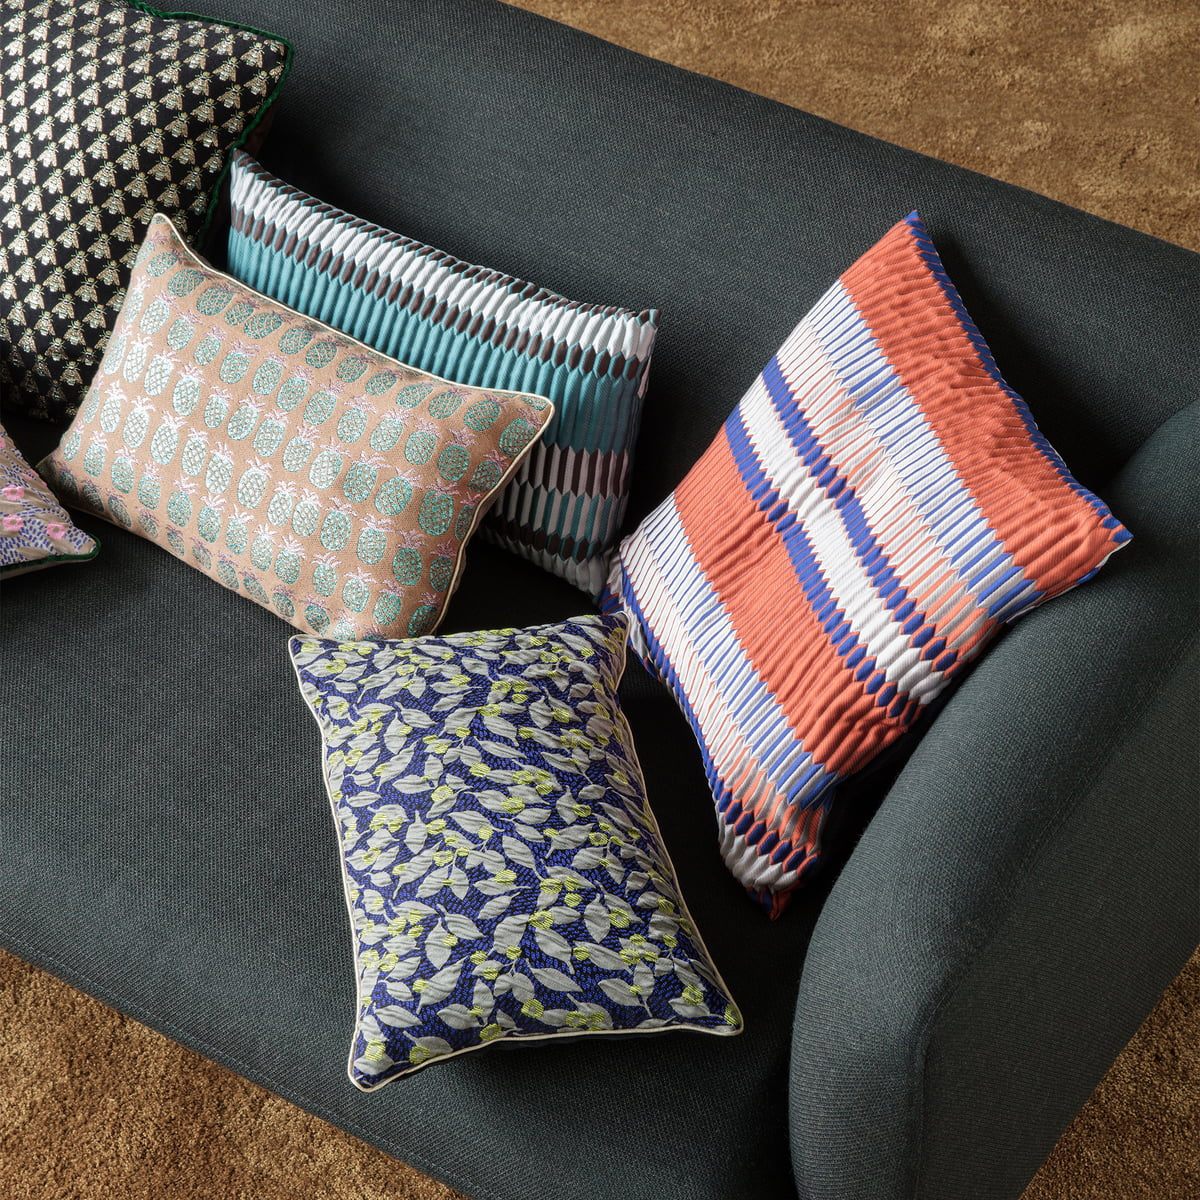 salon kissen rechteckig von ferm living. Black Bedroom Furniture Sets. Home Design Ideas